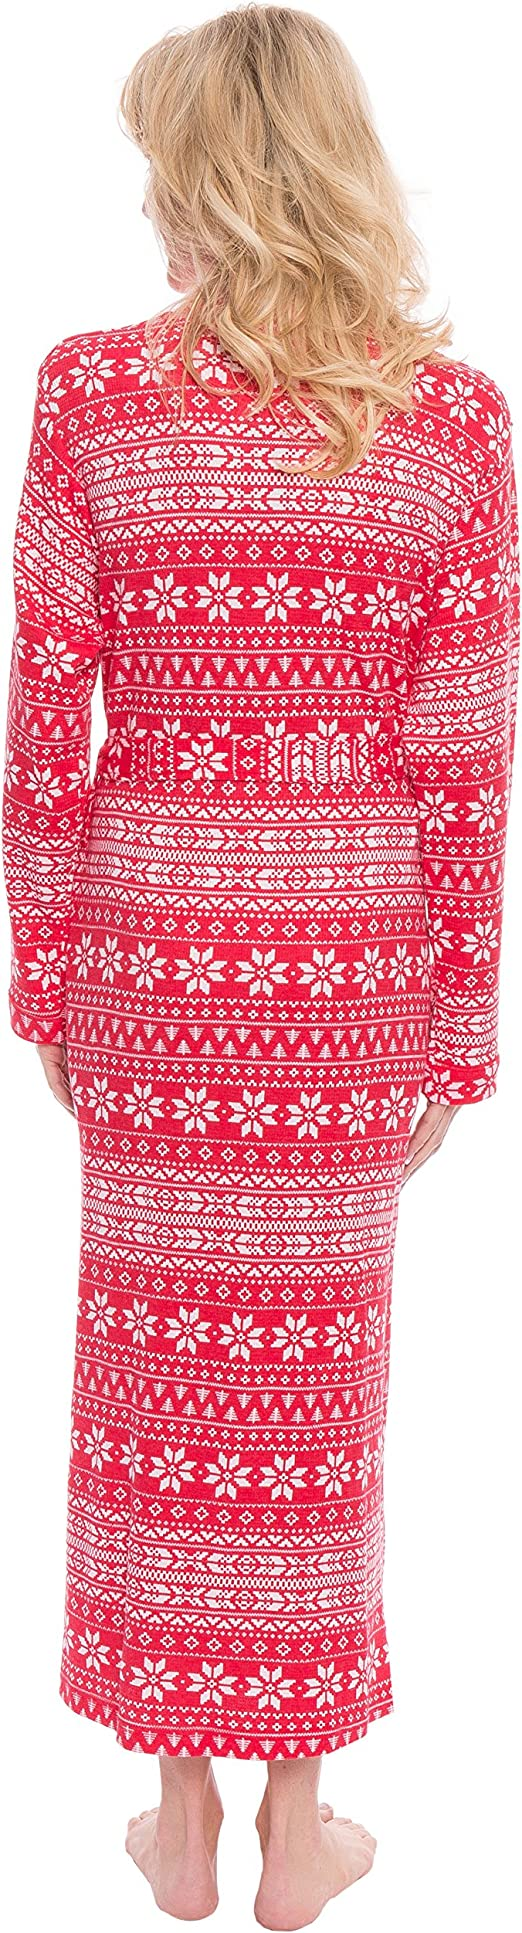 VINTATRE/Women/Kimono/Robes/Long/Knit/Bathrobe/Lightweight/Soft/Knit/Sleepwear/V-neck/Casual/Ladies/Loungewear